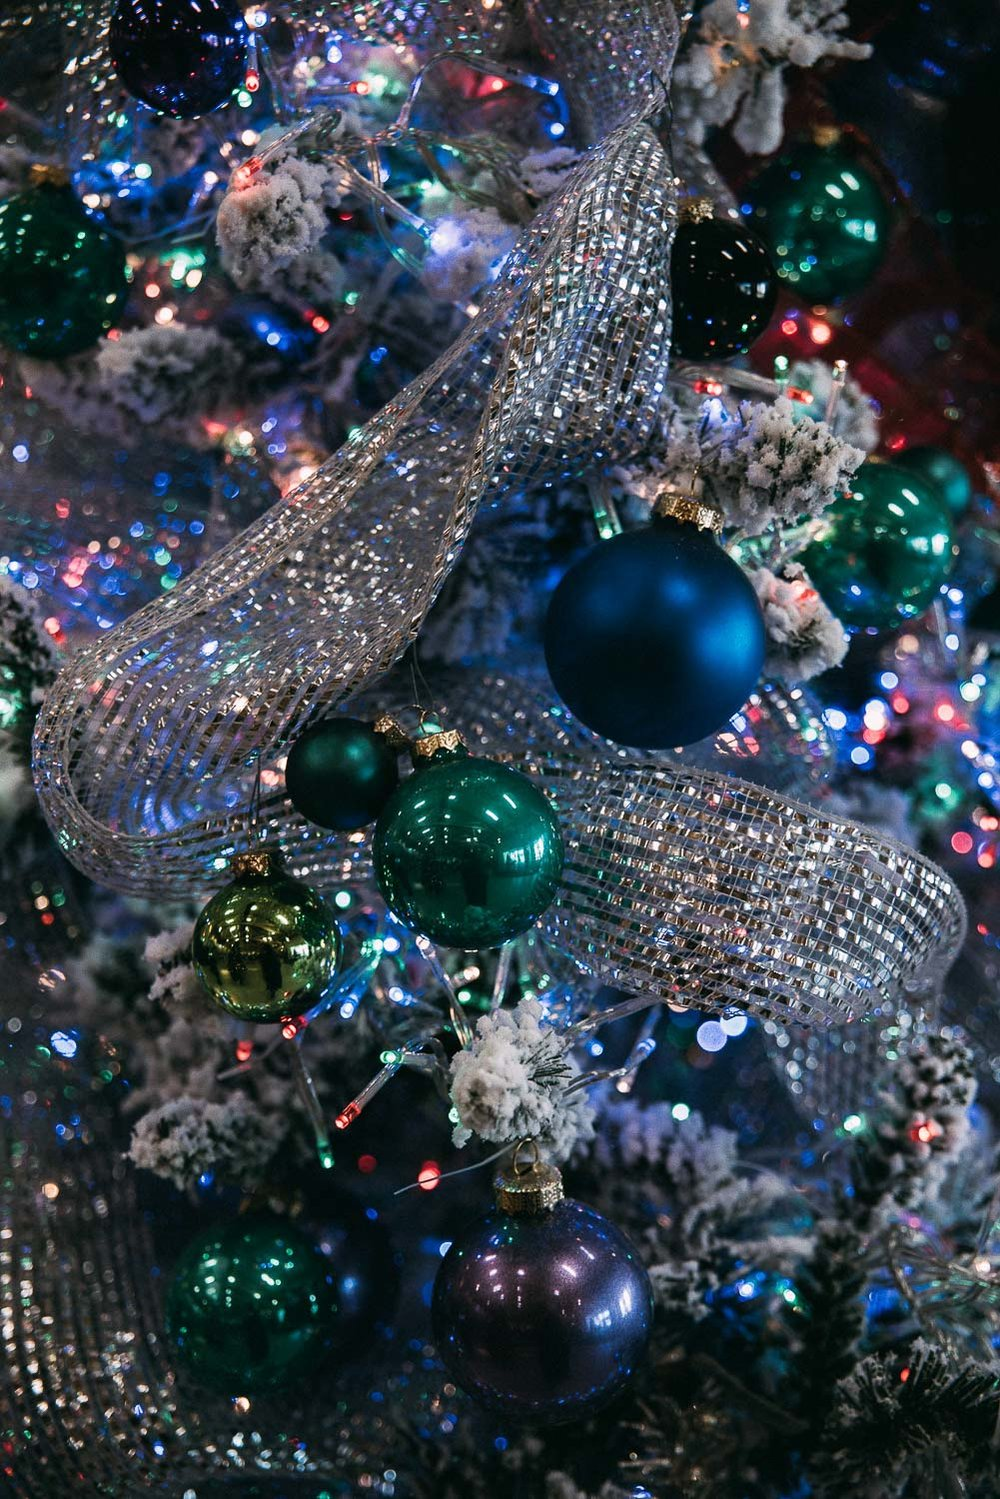 Kitschig amerikansk julgran